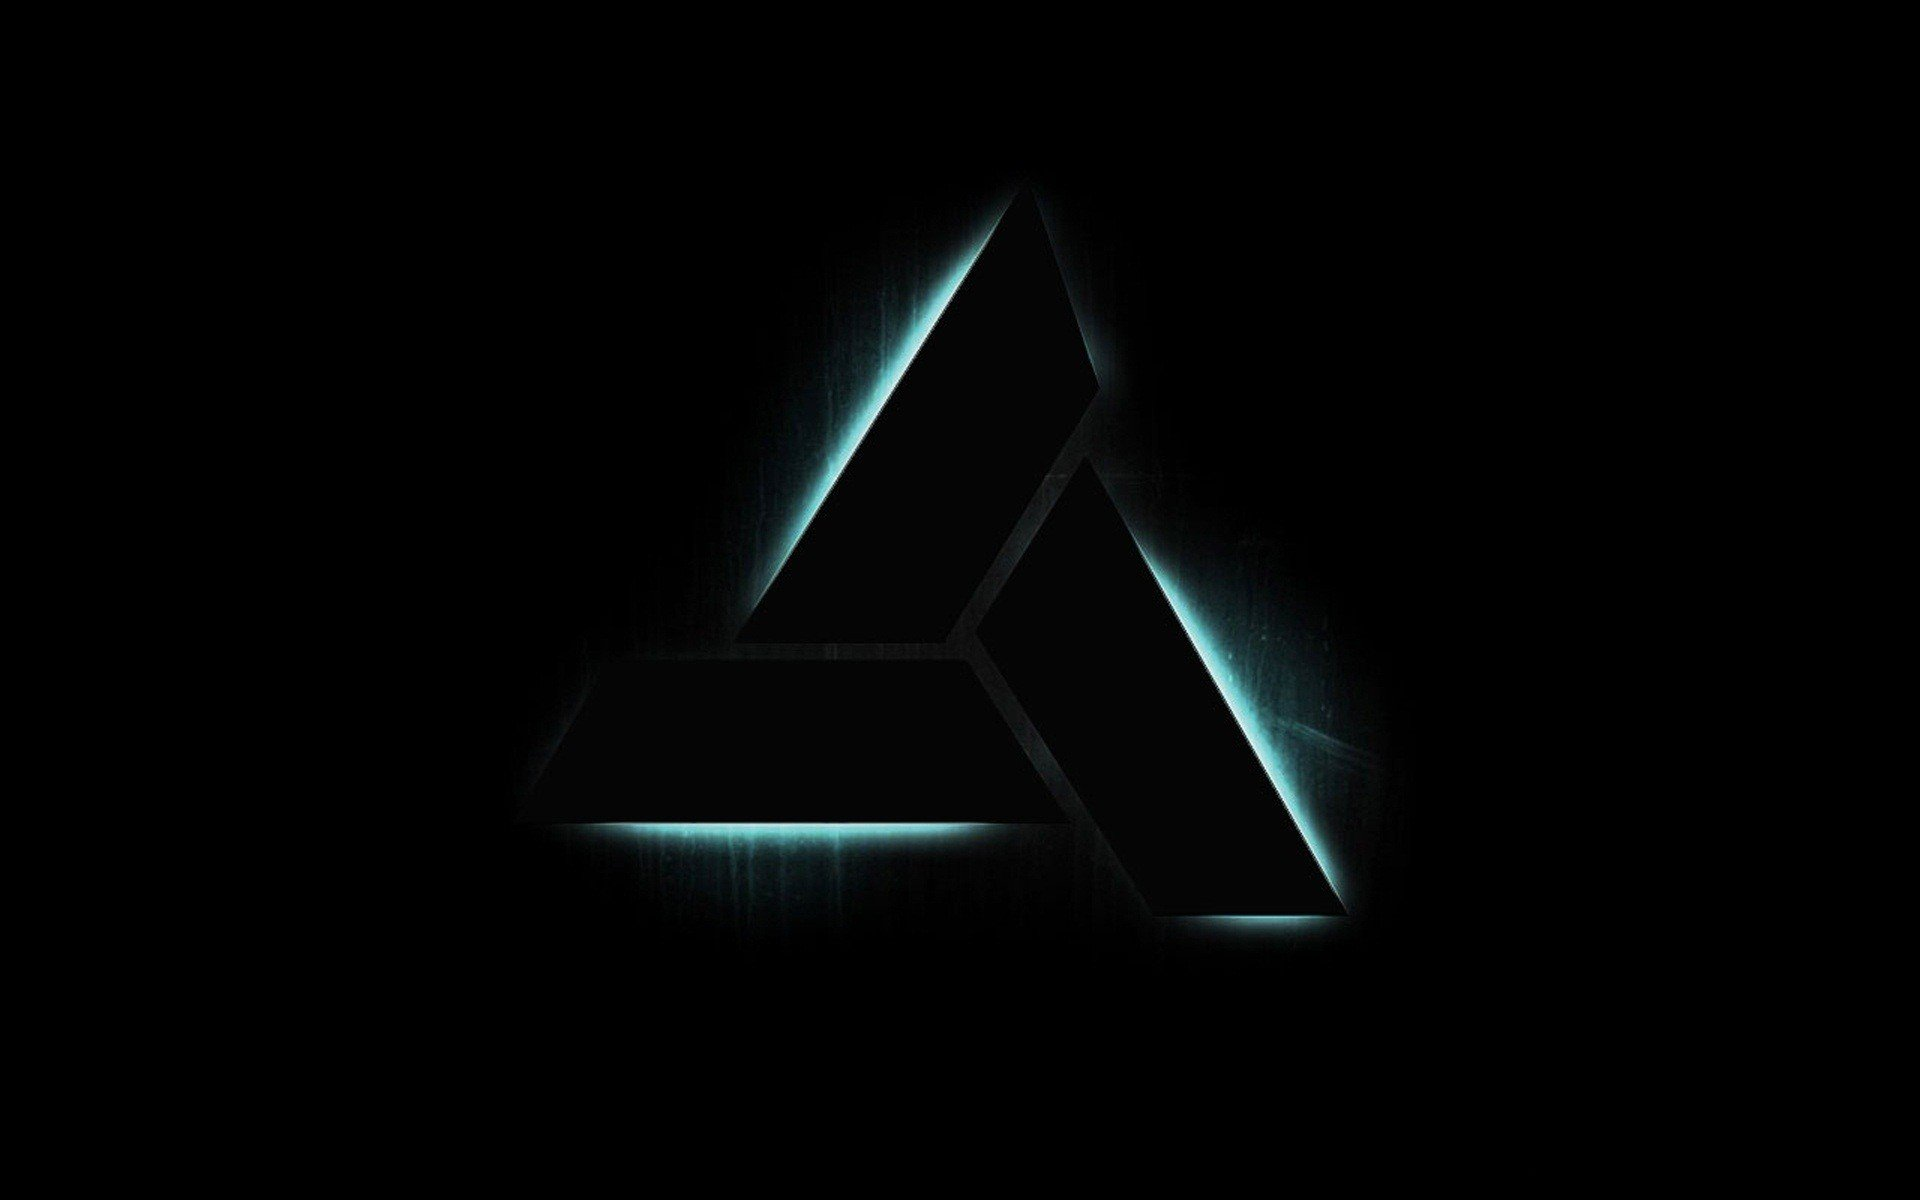 desktop assassins creed symbol - photo #14